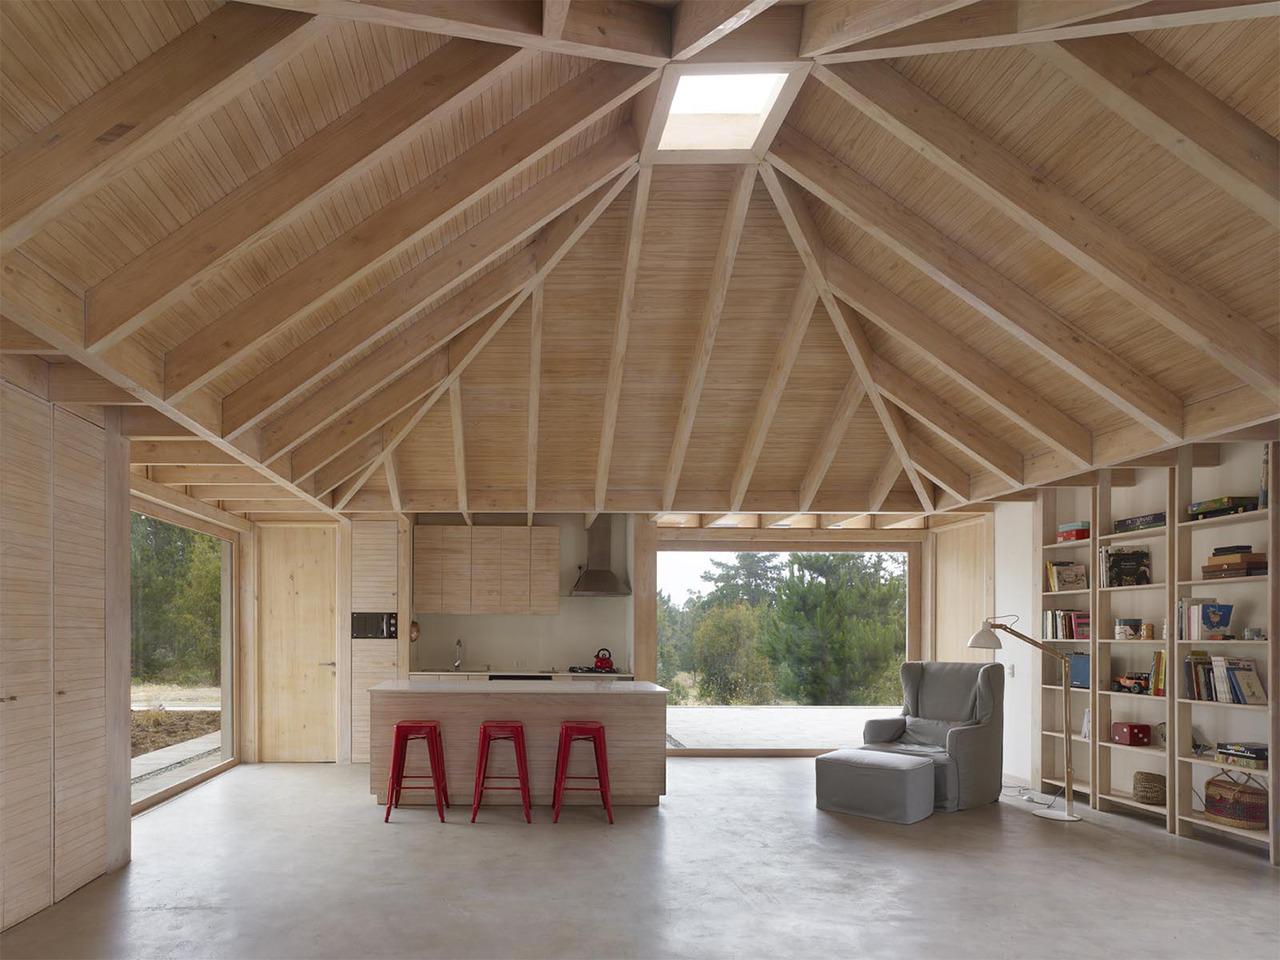 How To Install Skylight Properly L Essenziale Interiors